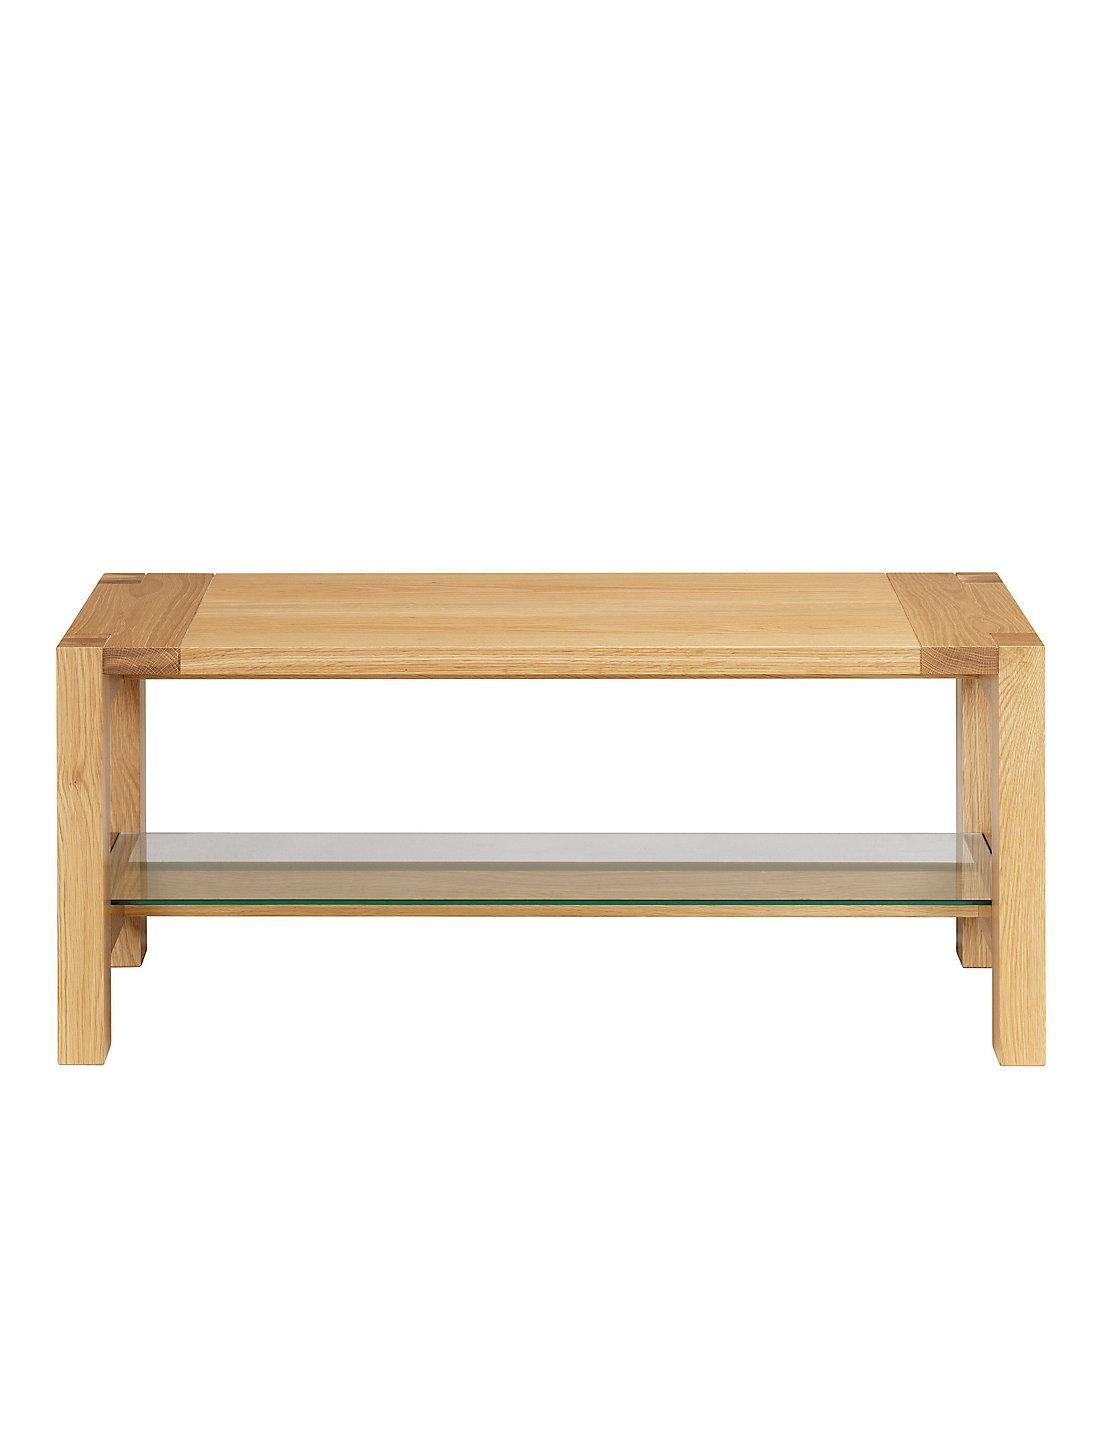 Sonoma light coffee table ms sonoma light coffee table geotapseo Choice Image